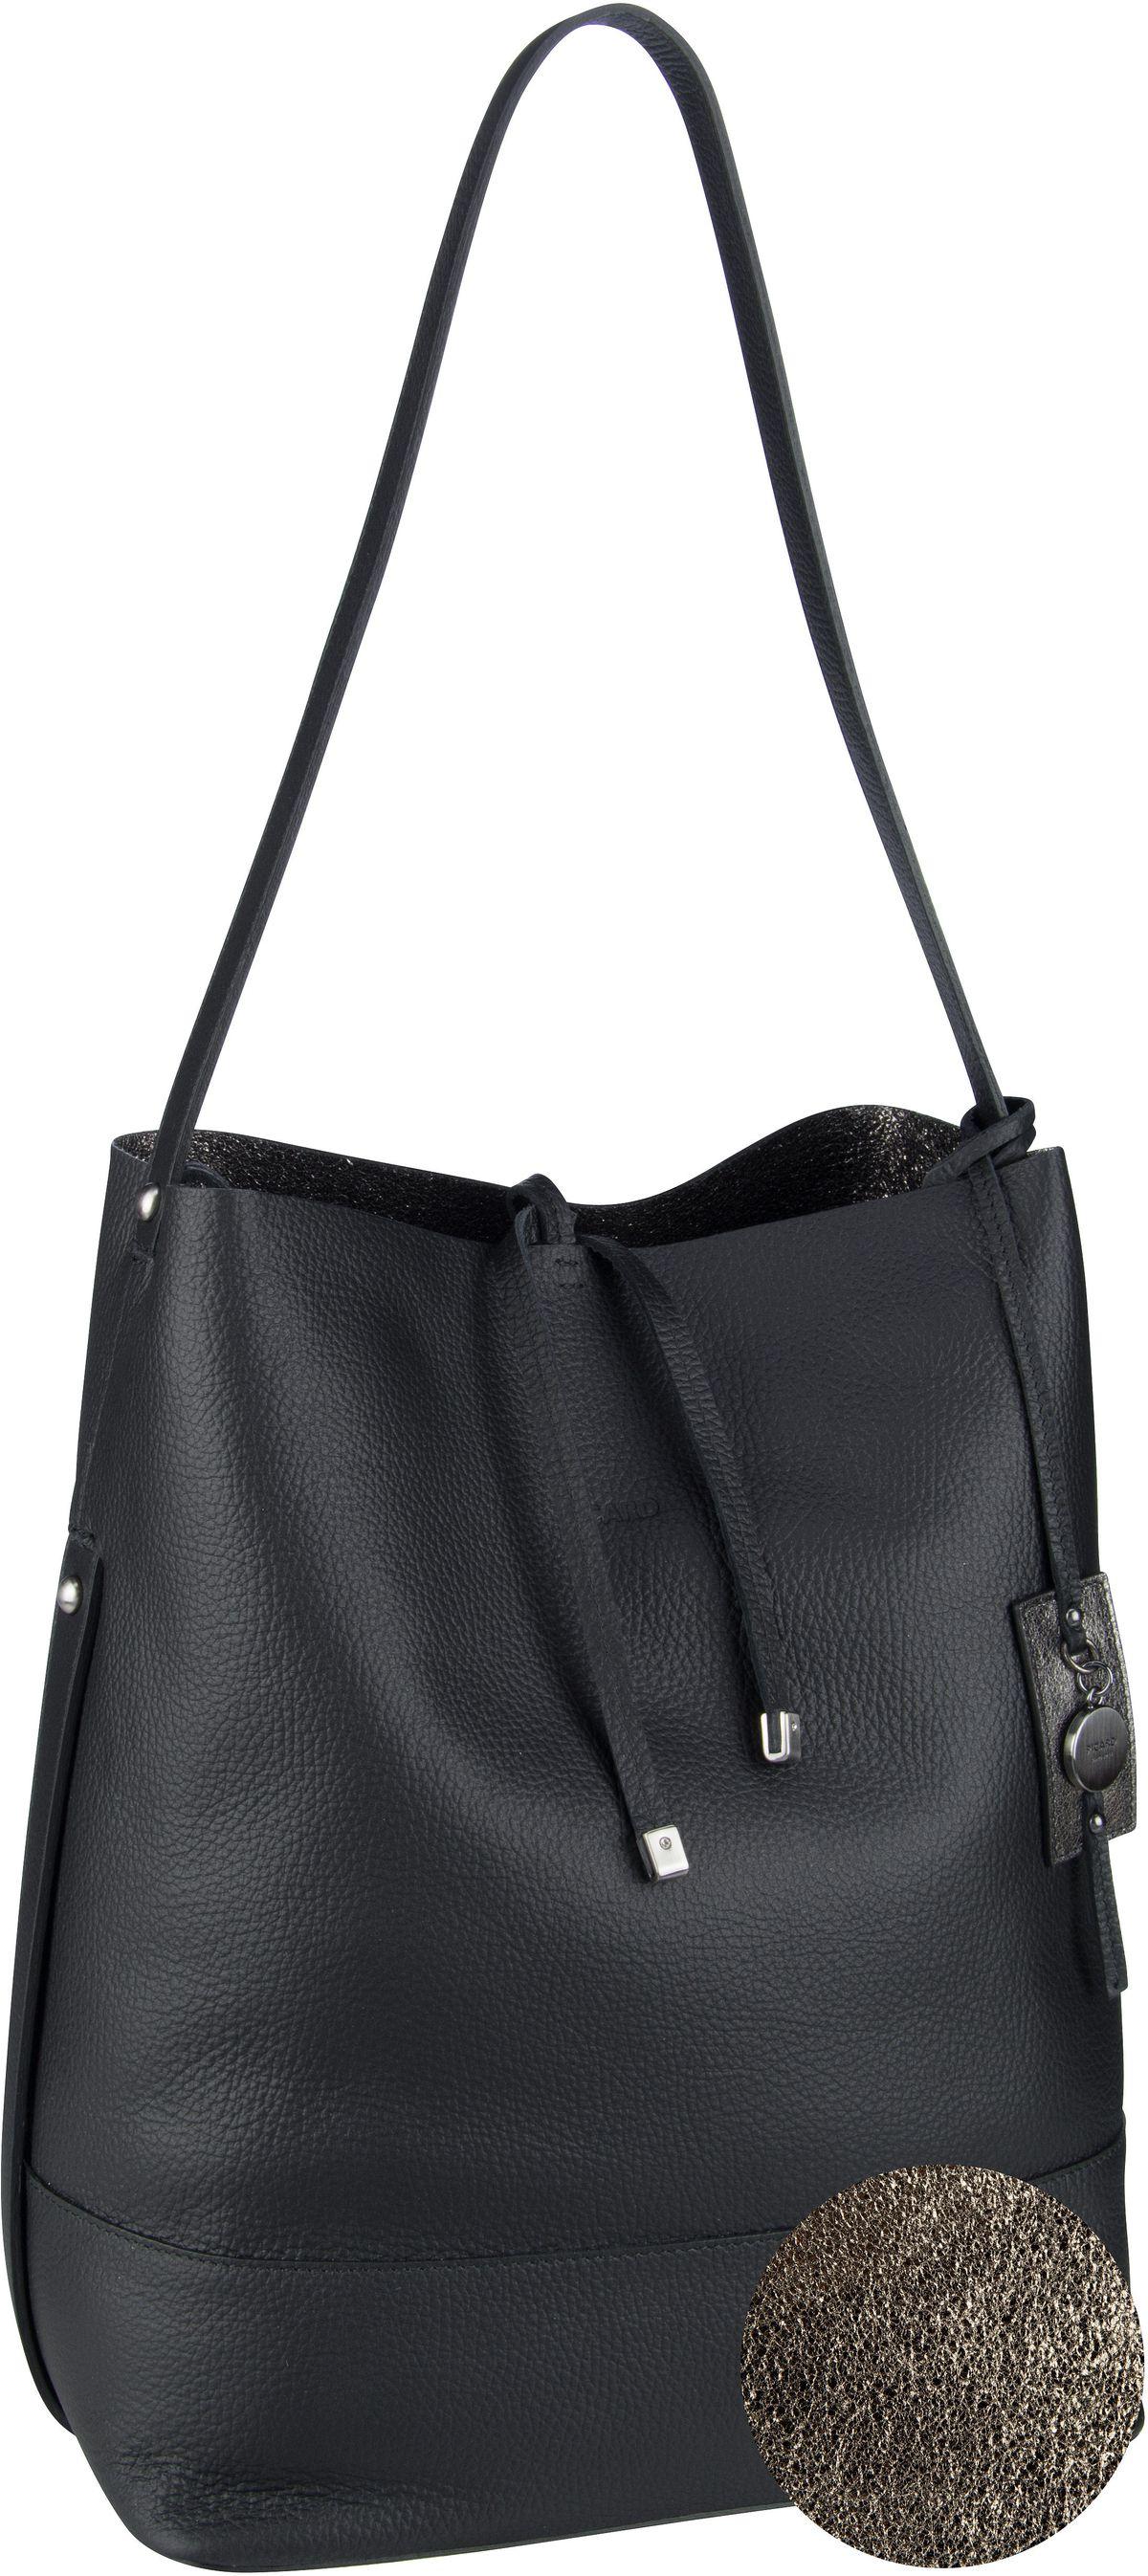 Handtasche Eclectic 4898 Schwarz (innen: Silber)